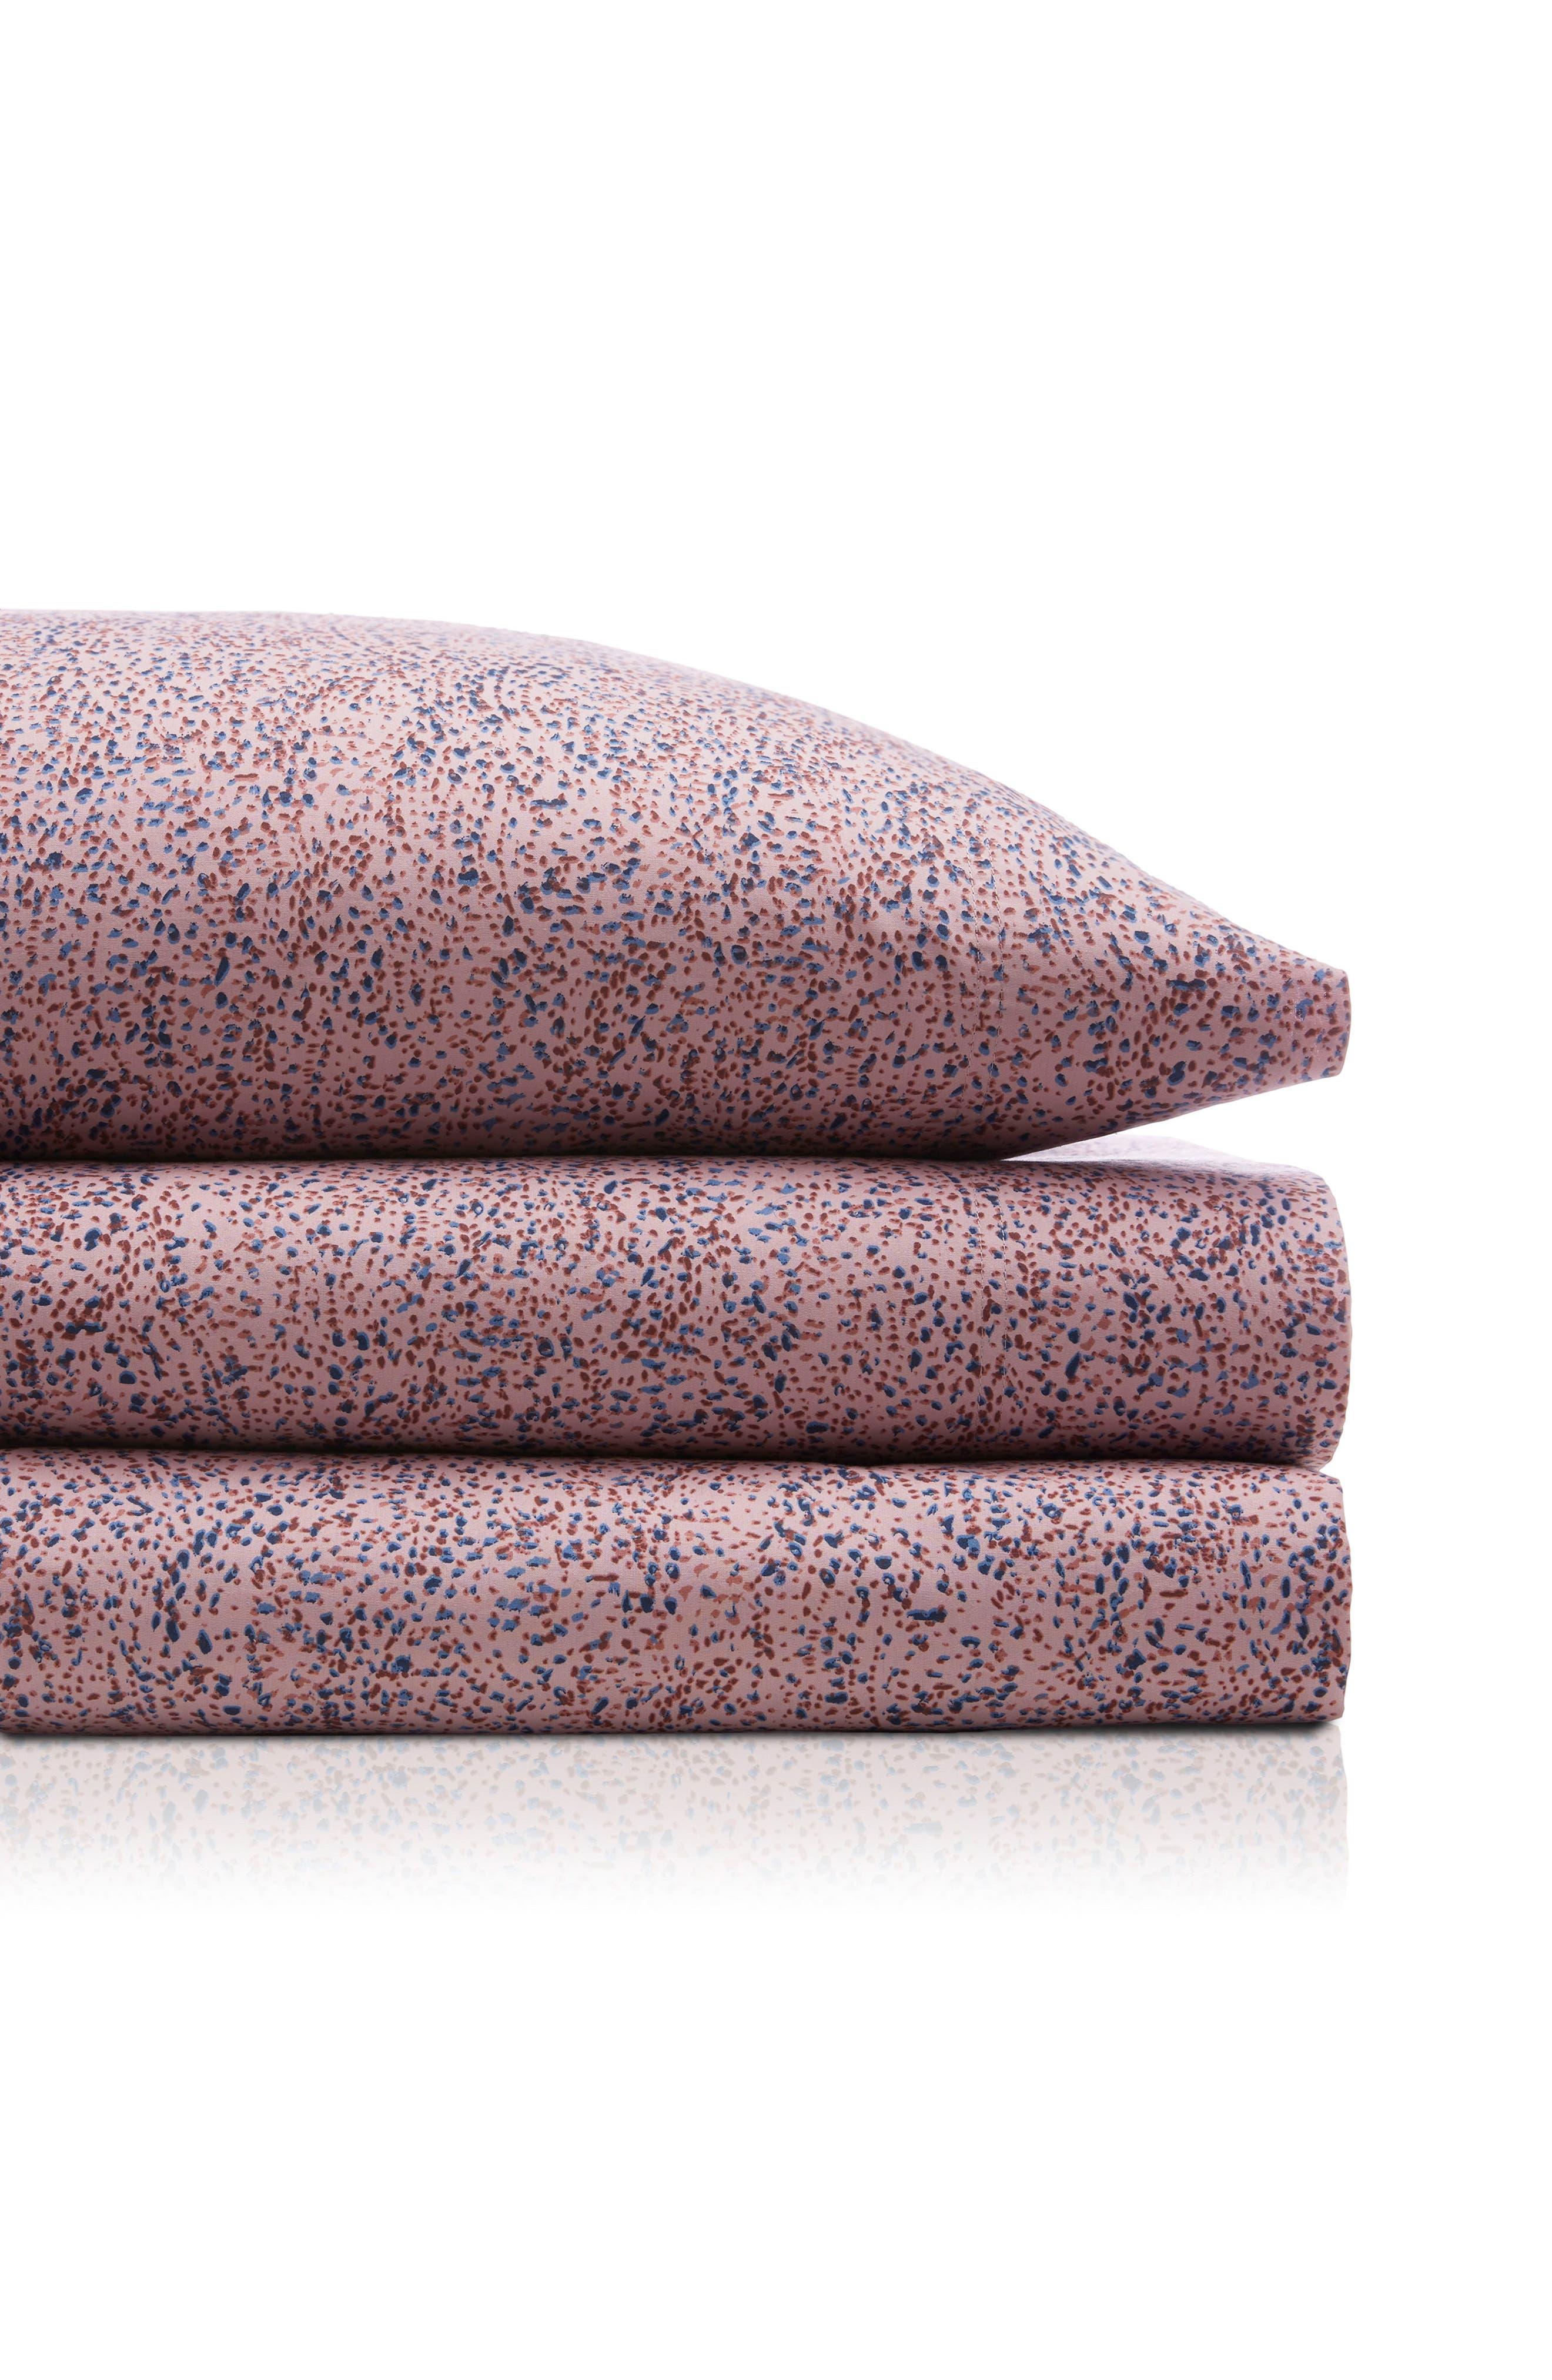 BCBGeneration Small Dots Pillowcases